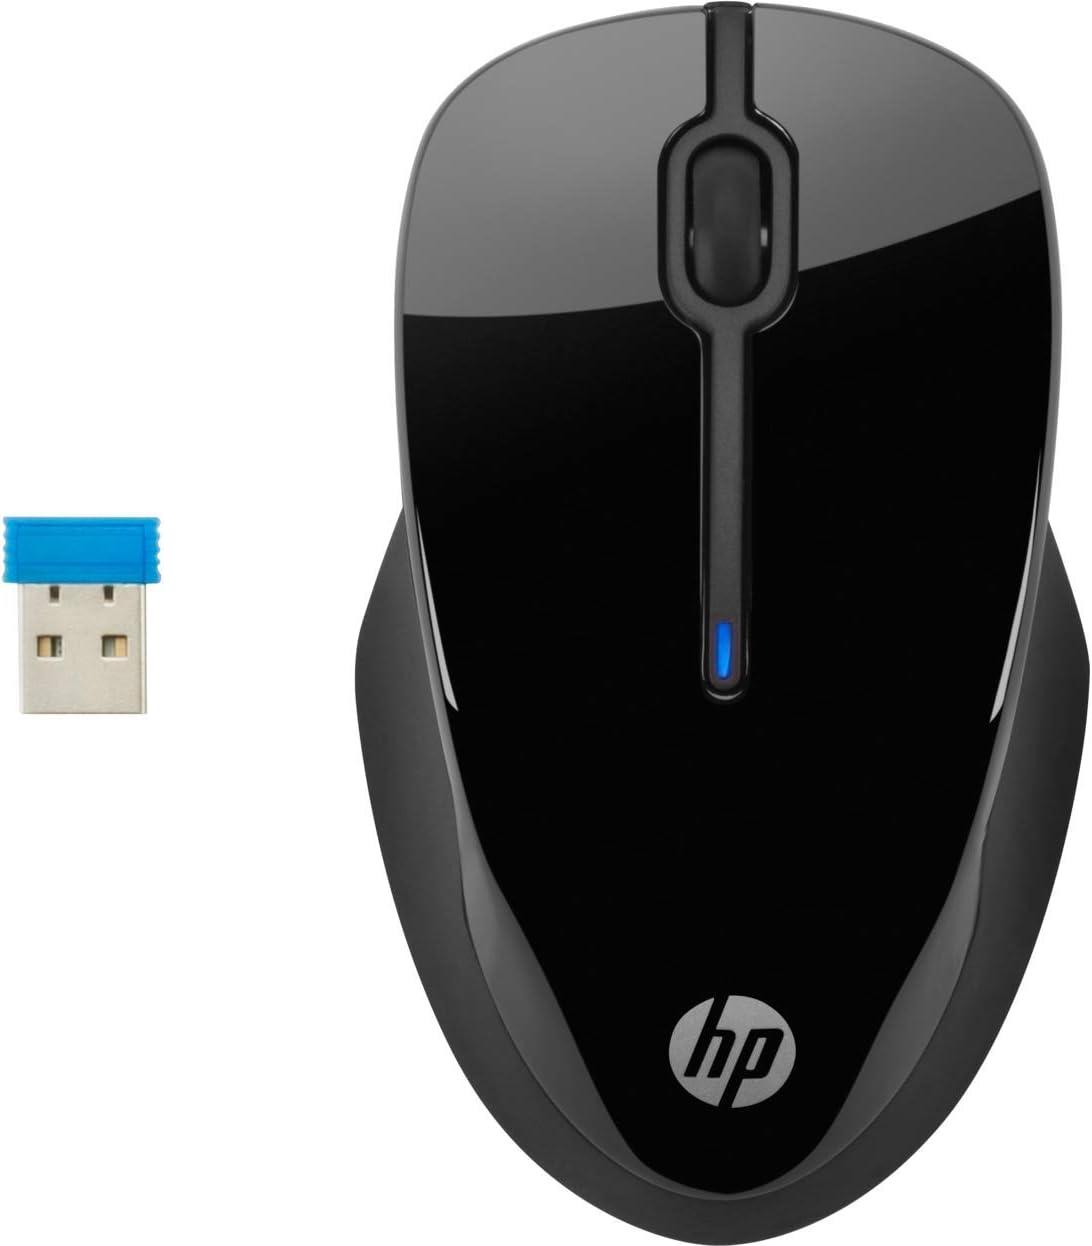 HP 220 Wireless Mouse Blue LED Technology Black Contoured and Ergonomic